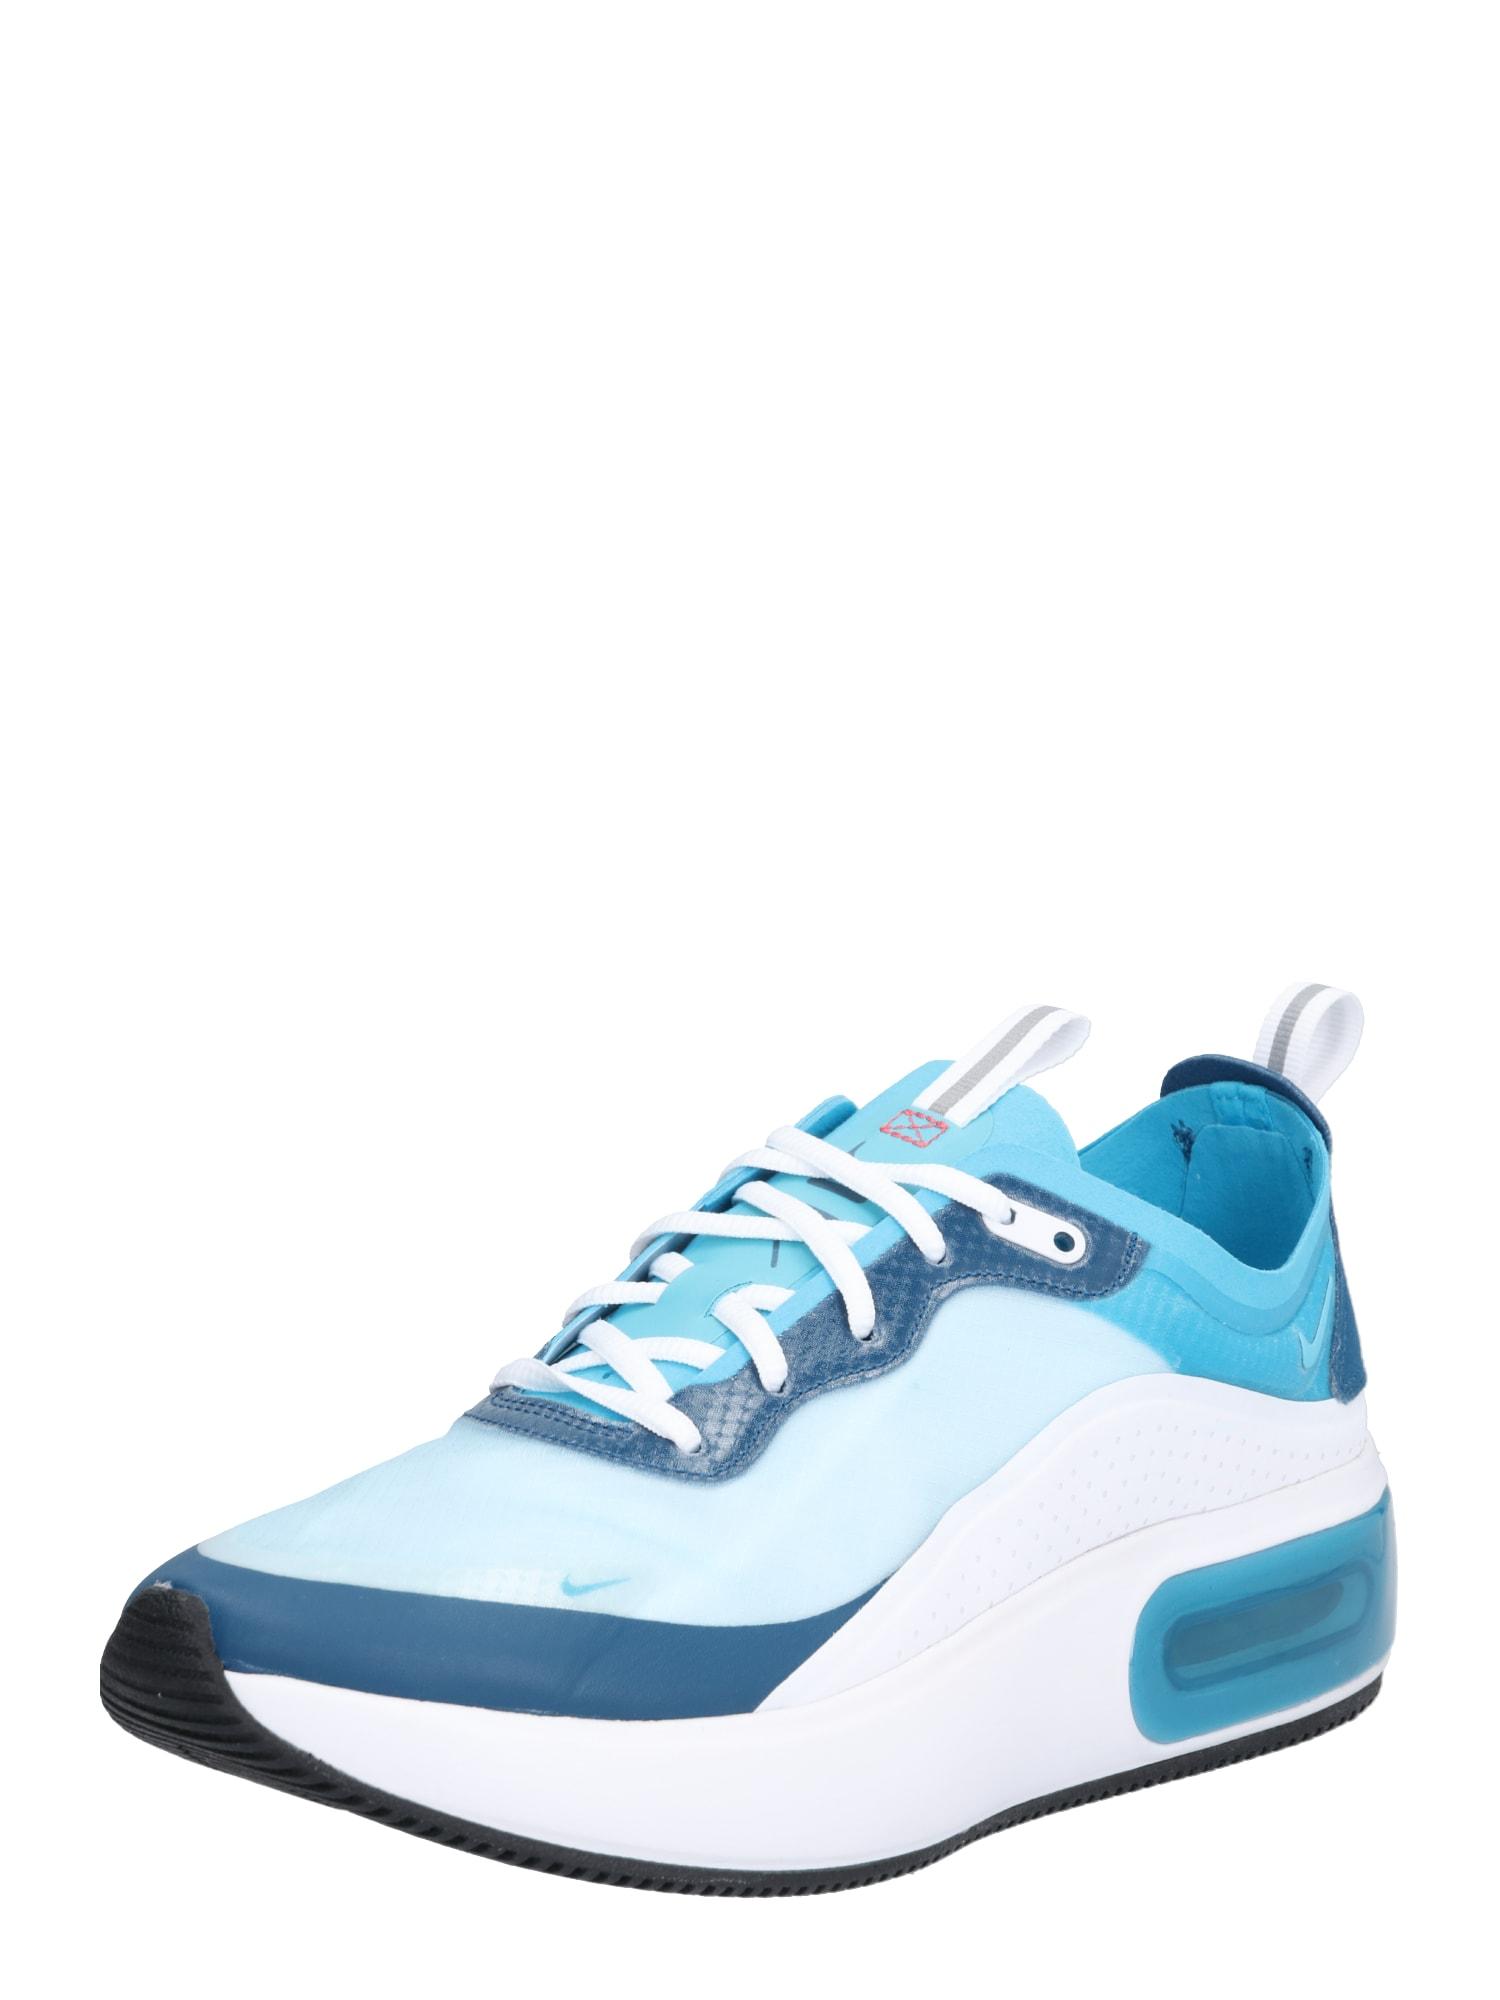 Tenisky Nike Air Max Dia SE modrá světlemodrá bílá Nike Sportswear